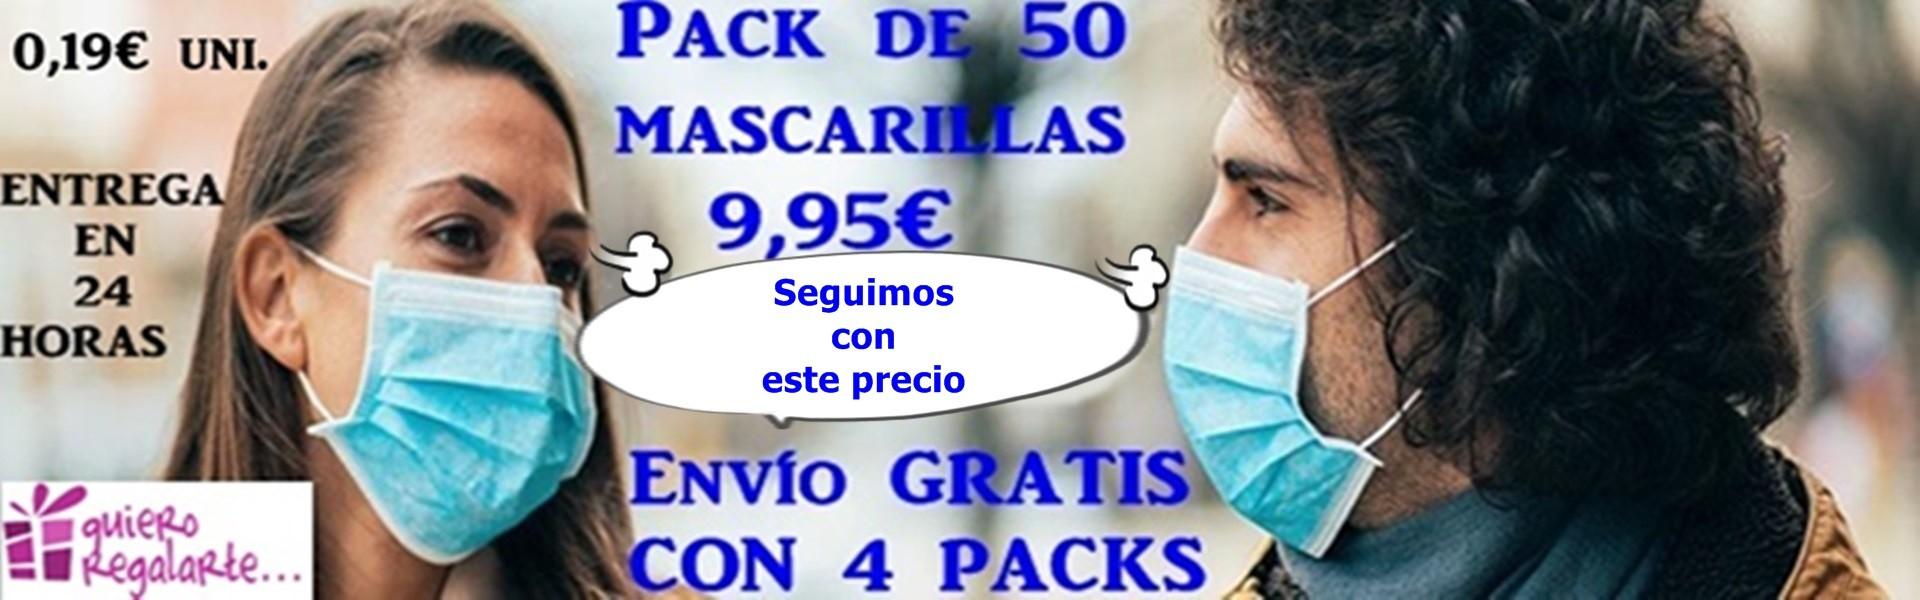 Mascarillas quirúrgicas homologadas 0,19